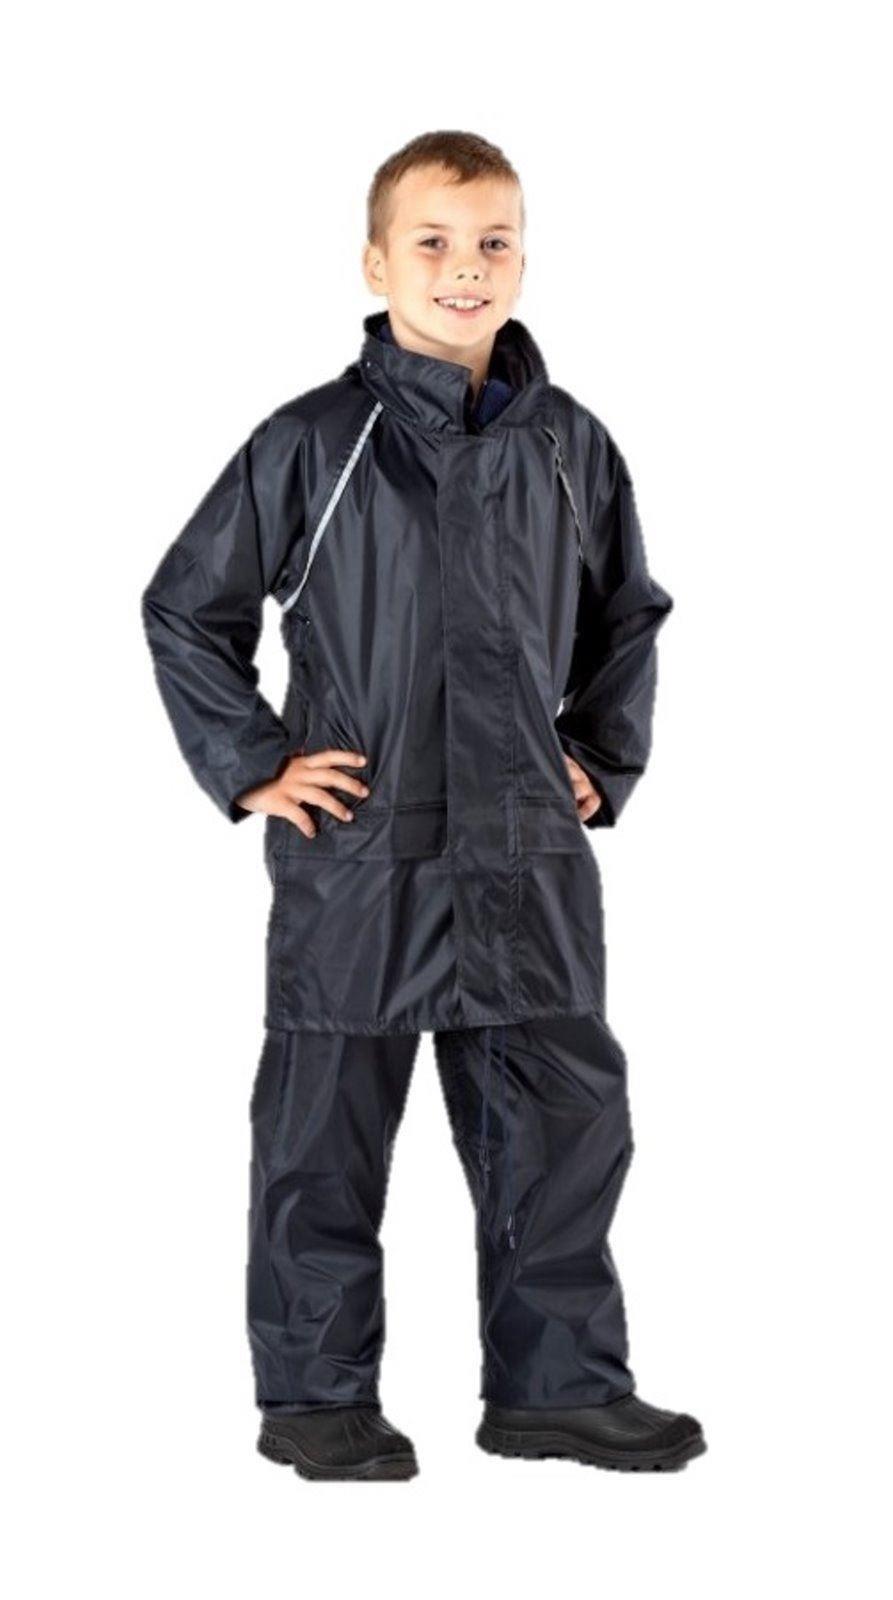 Boys Childrens Navy Camo Waterproof Rain Suit Coat Trousers Pants